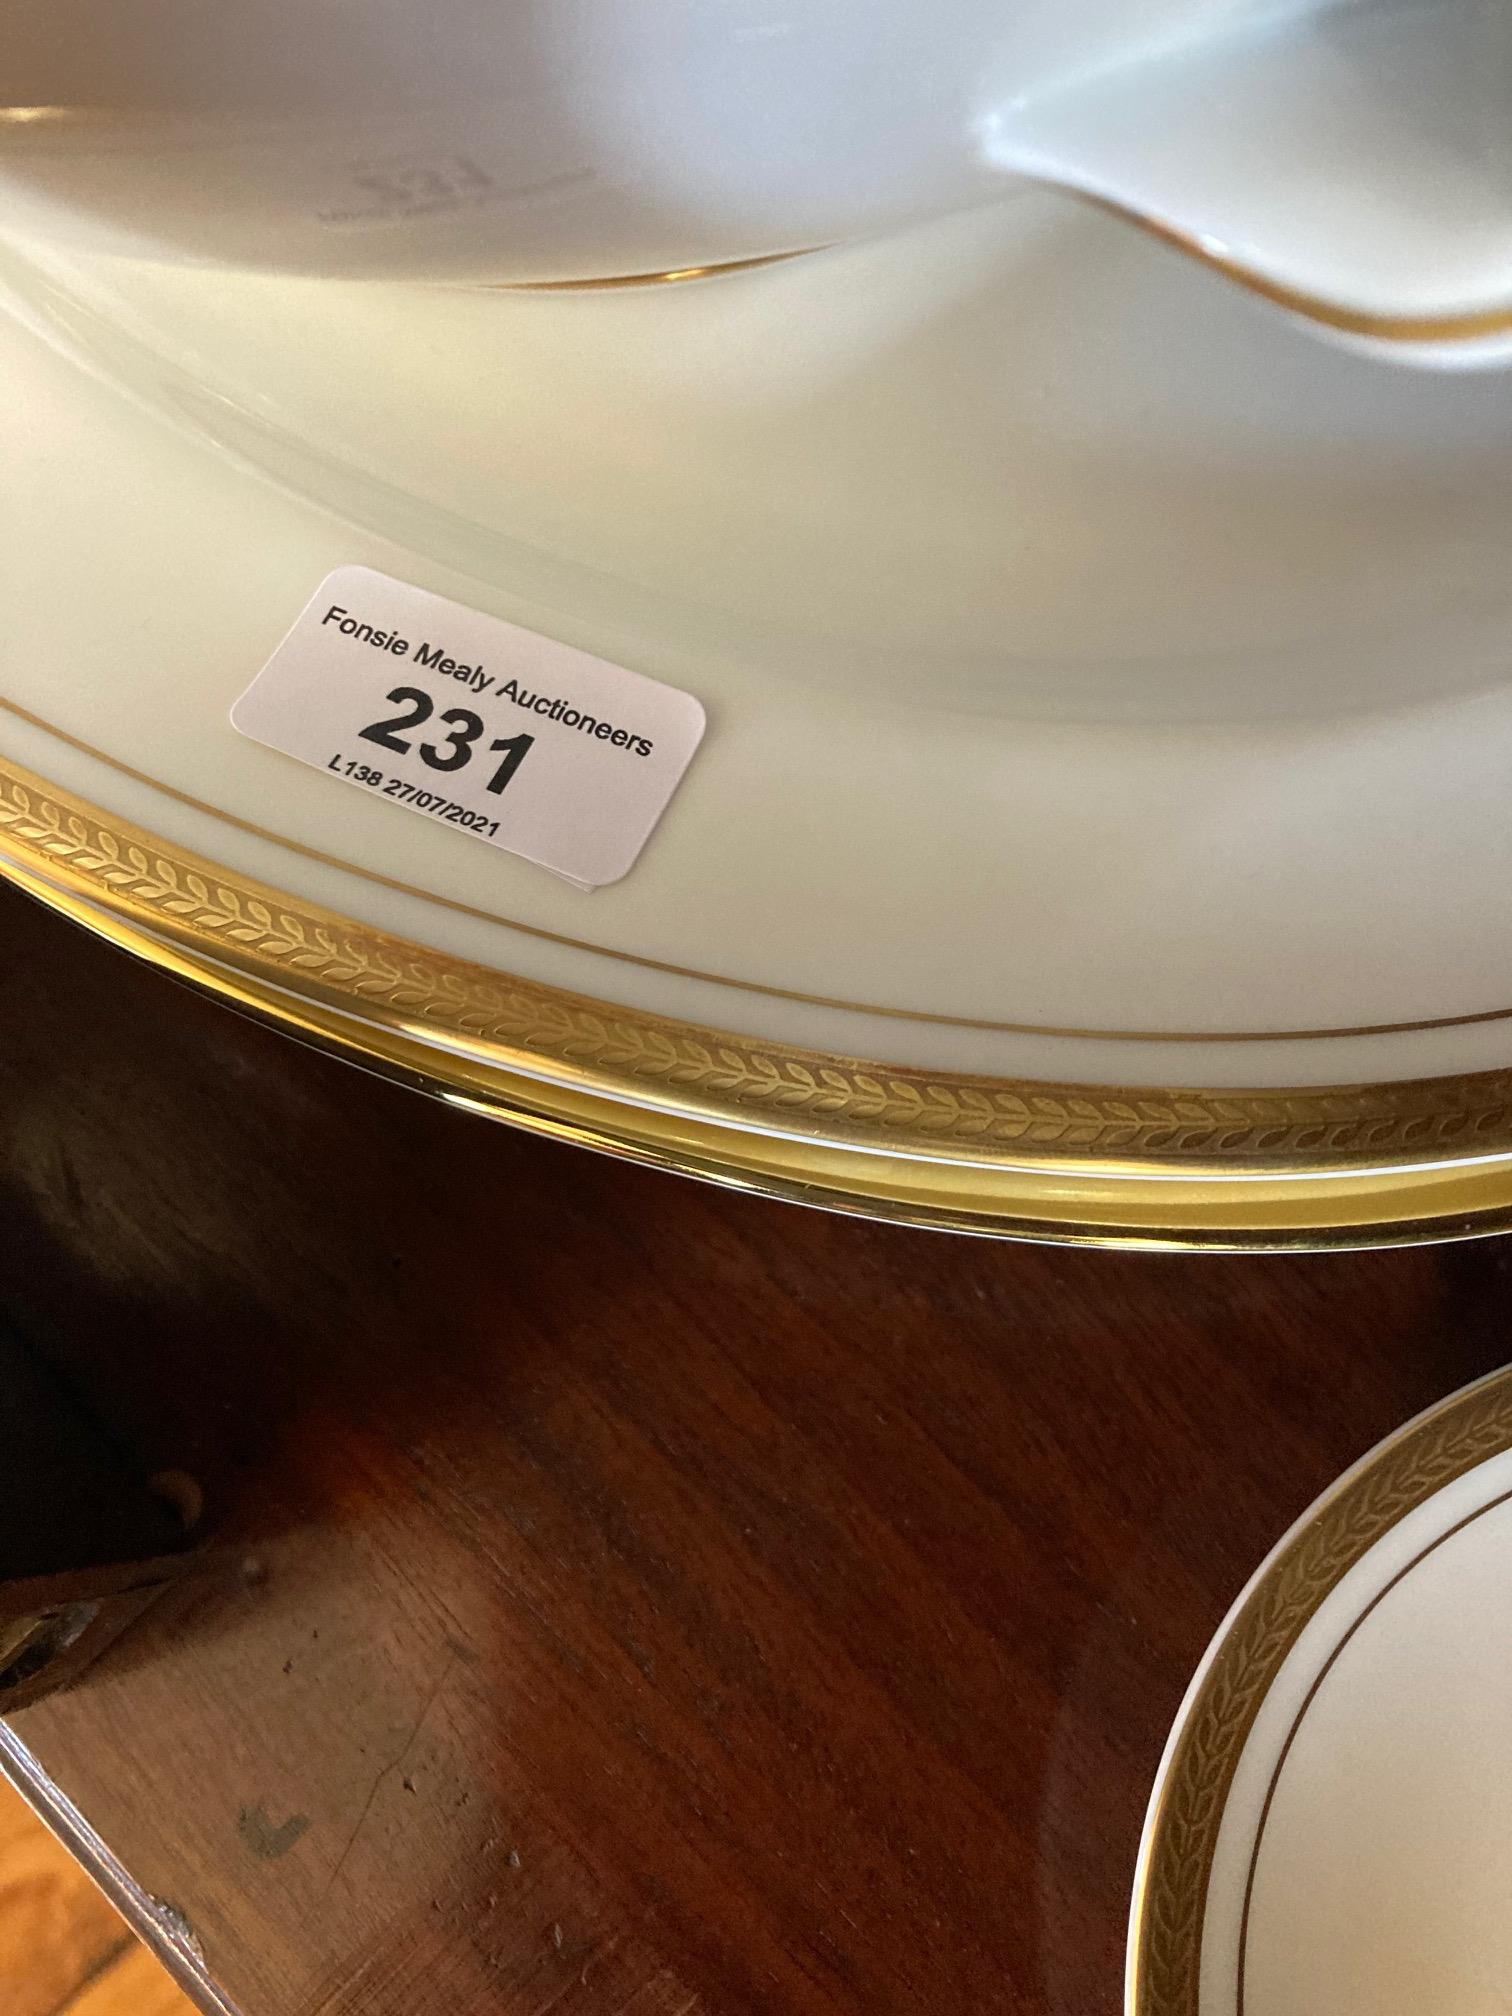 A fine Belleek Presentation Dinner, Tea, Coffee Service By Aynsley - Image 2 of 7